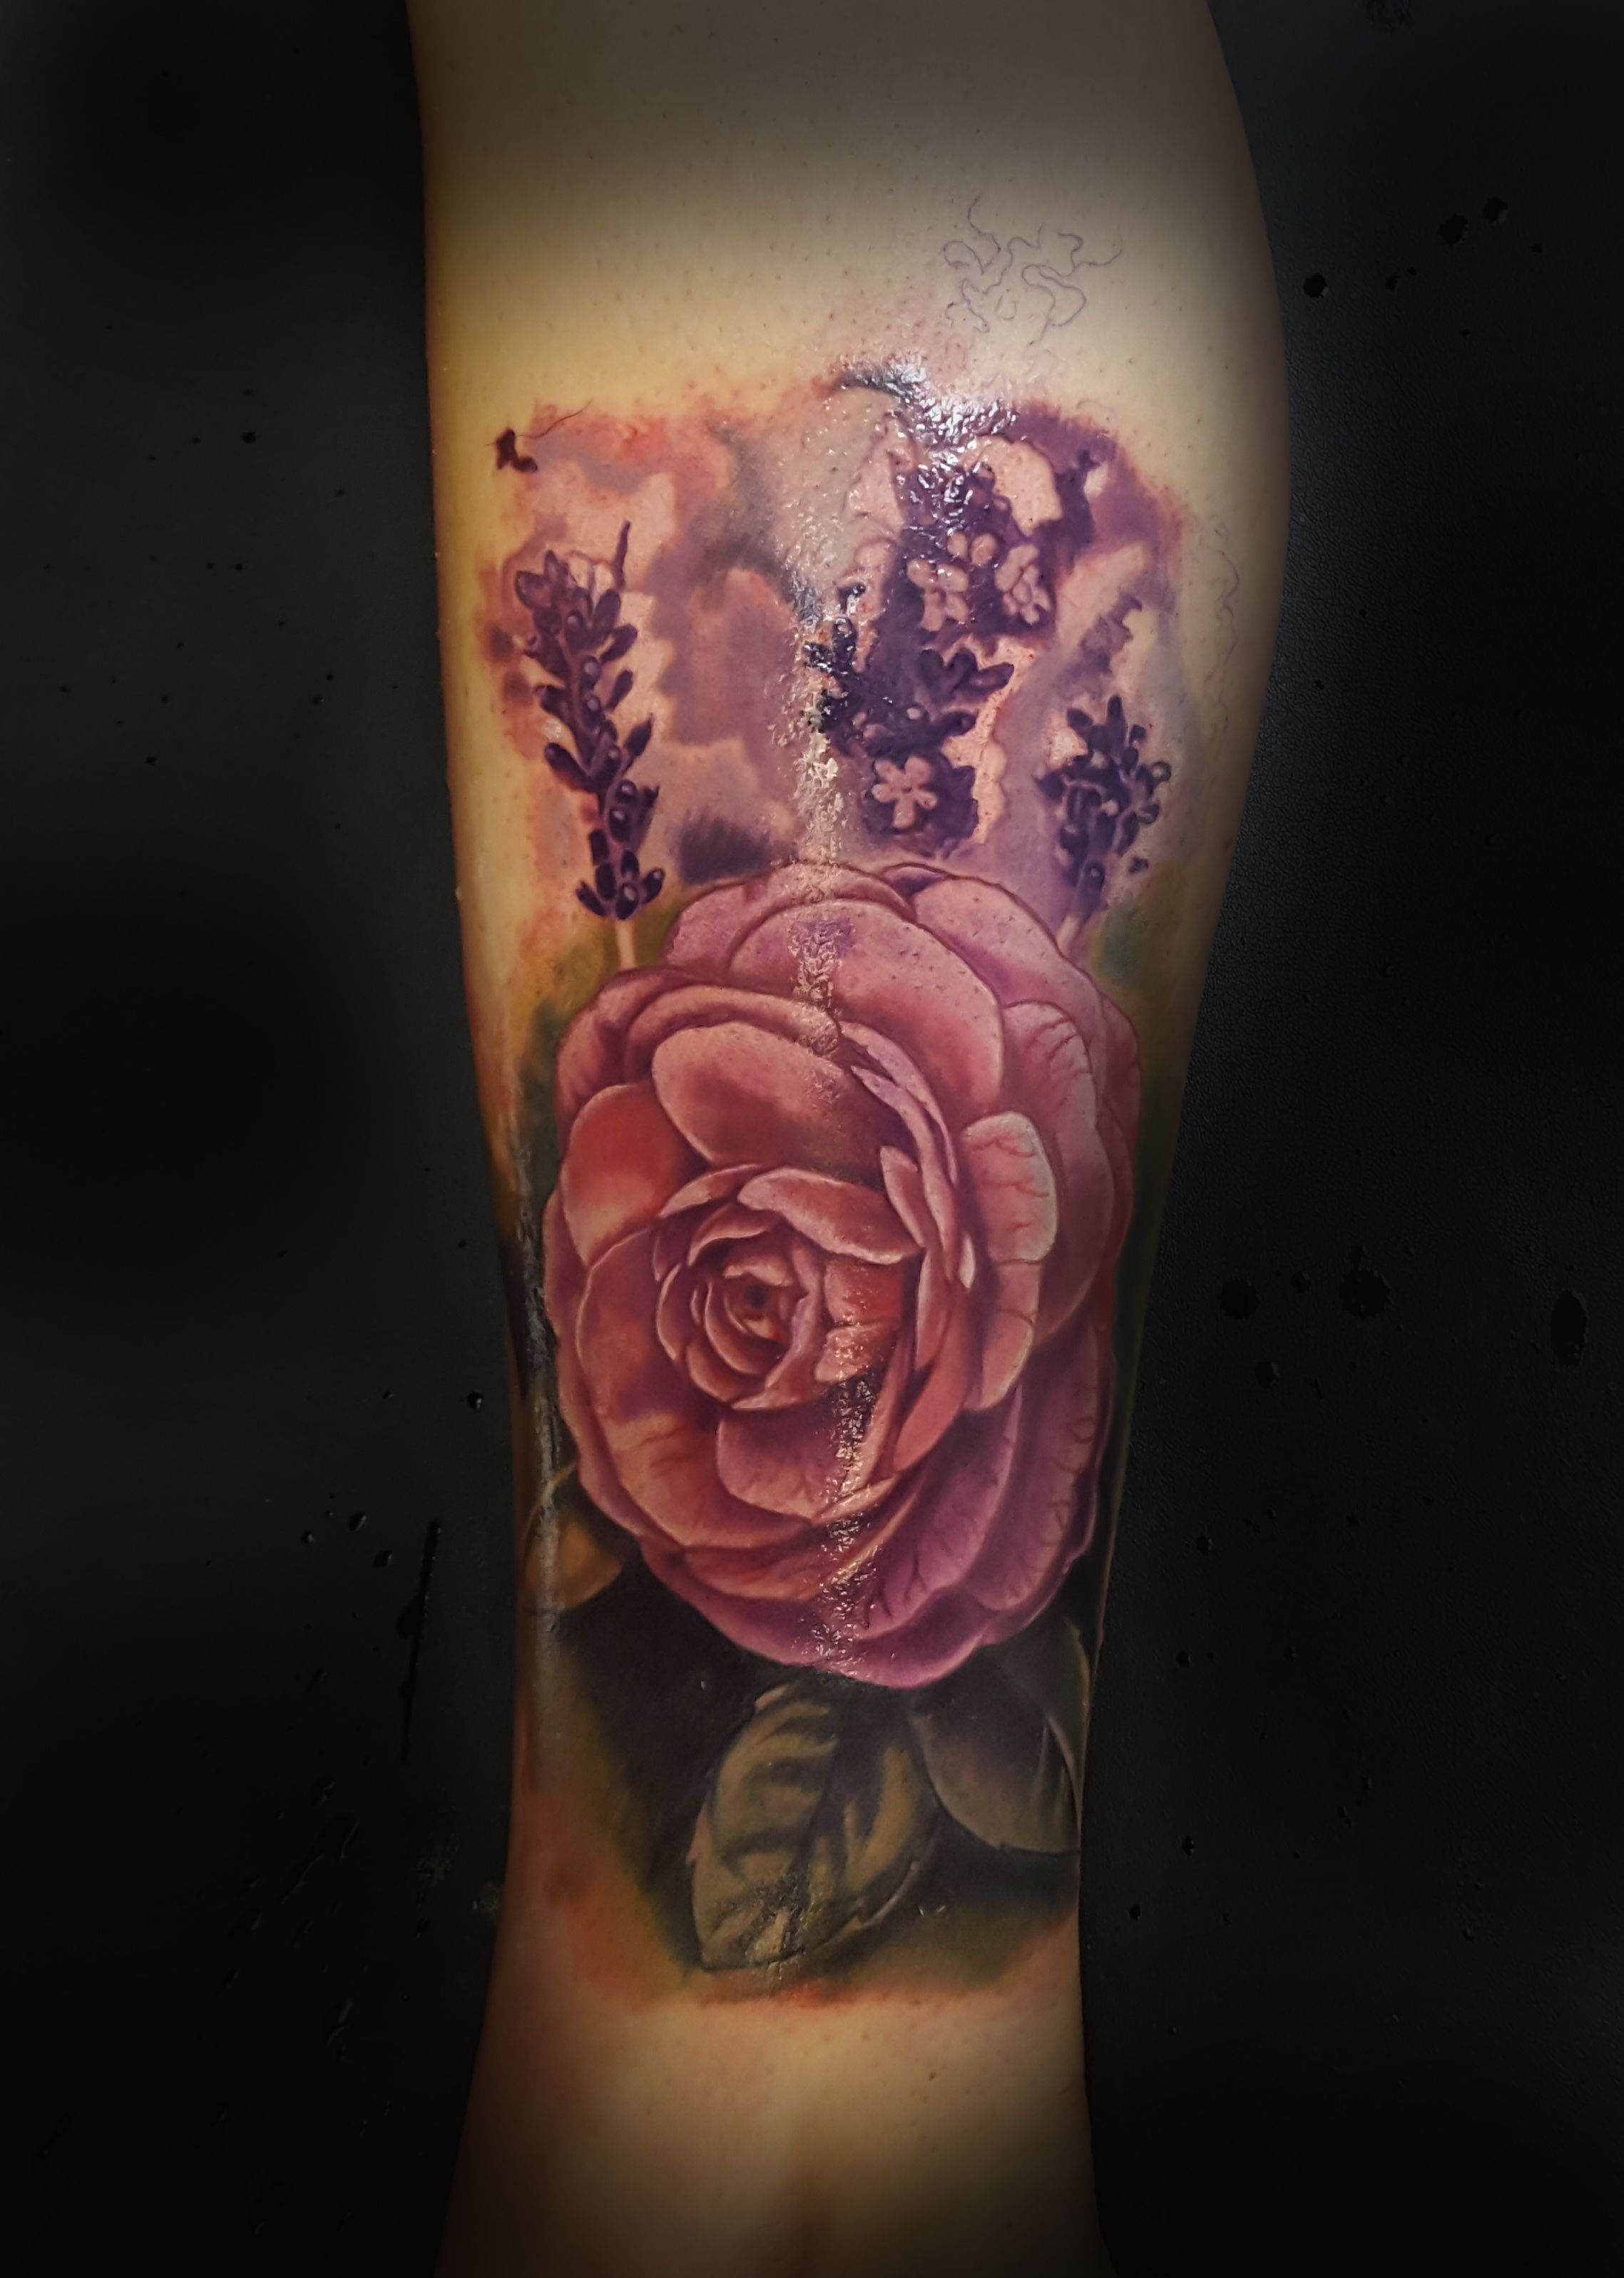 Flower Tattoo Mike Evans Tattoos Realism Tattoo Oklahoma Tattoos Elite Skin Art Flower Tattoo Tattoos Skin Art